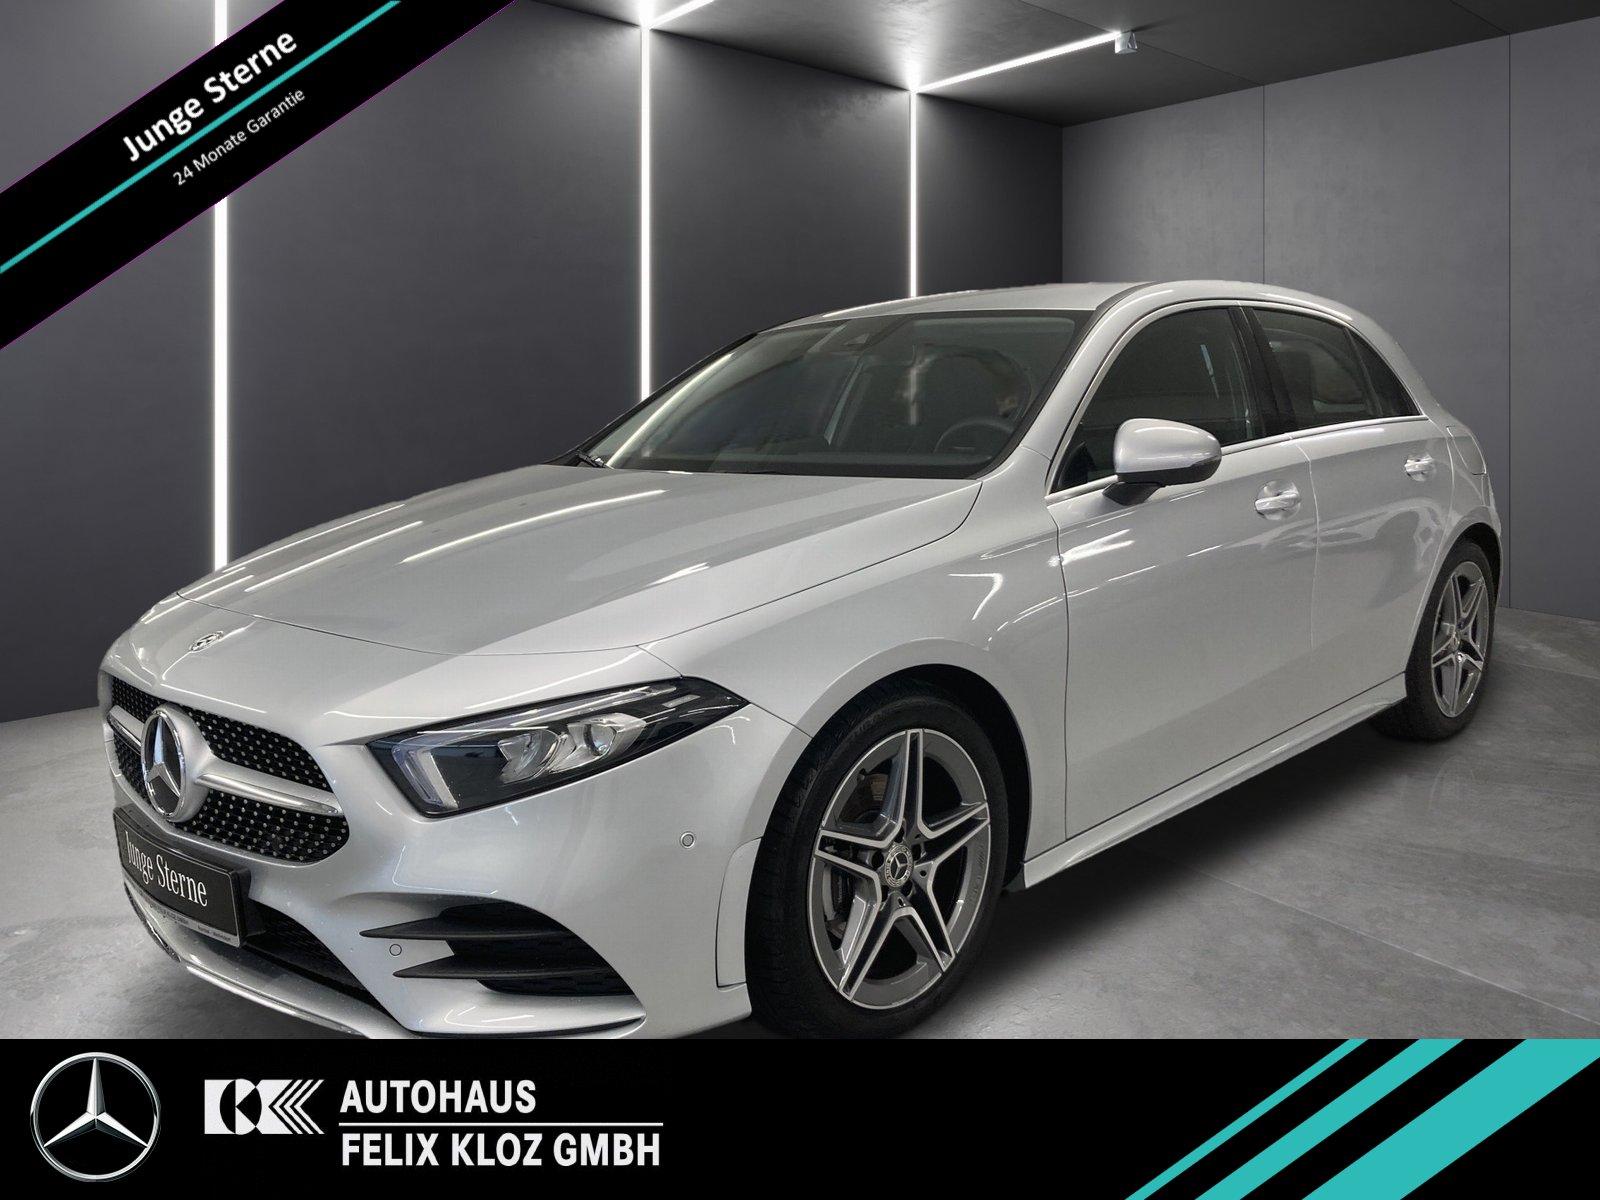 Mercedes-Benz A 200 AMG*NaviPrem*Kamera*LED*Spurhalte*Sitzheiz, Jahr 2020, Benzin